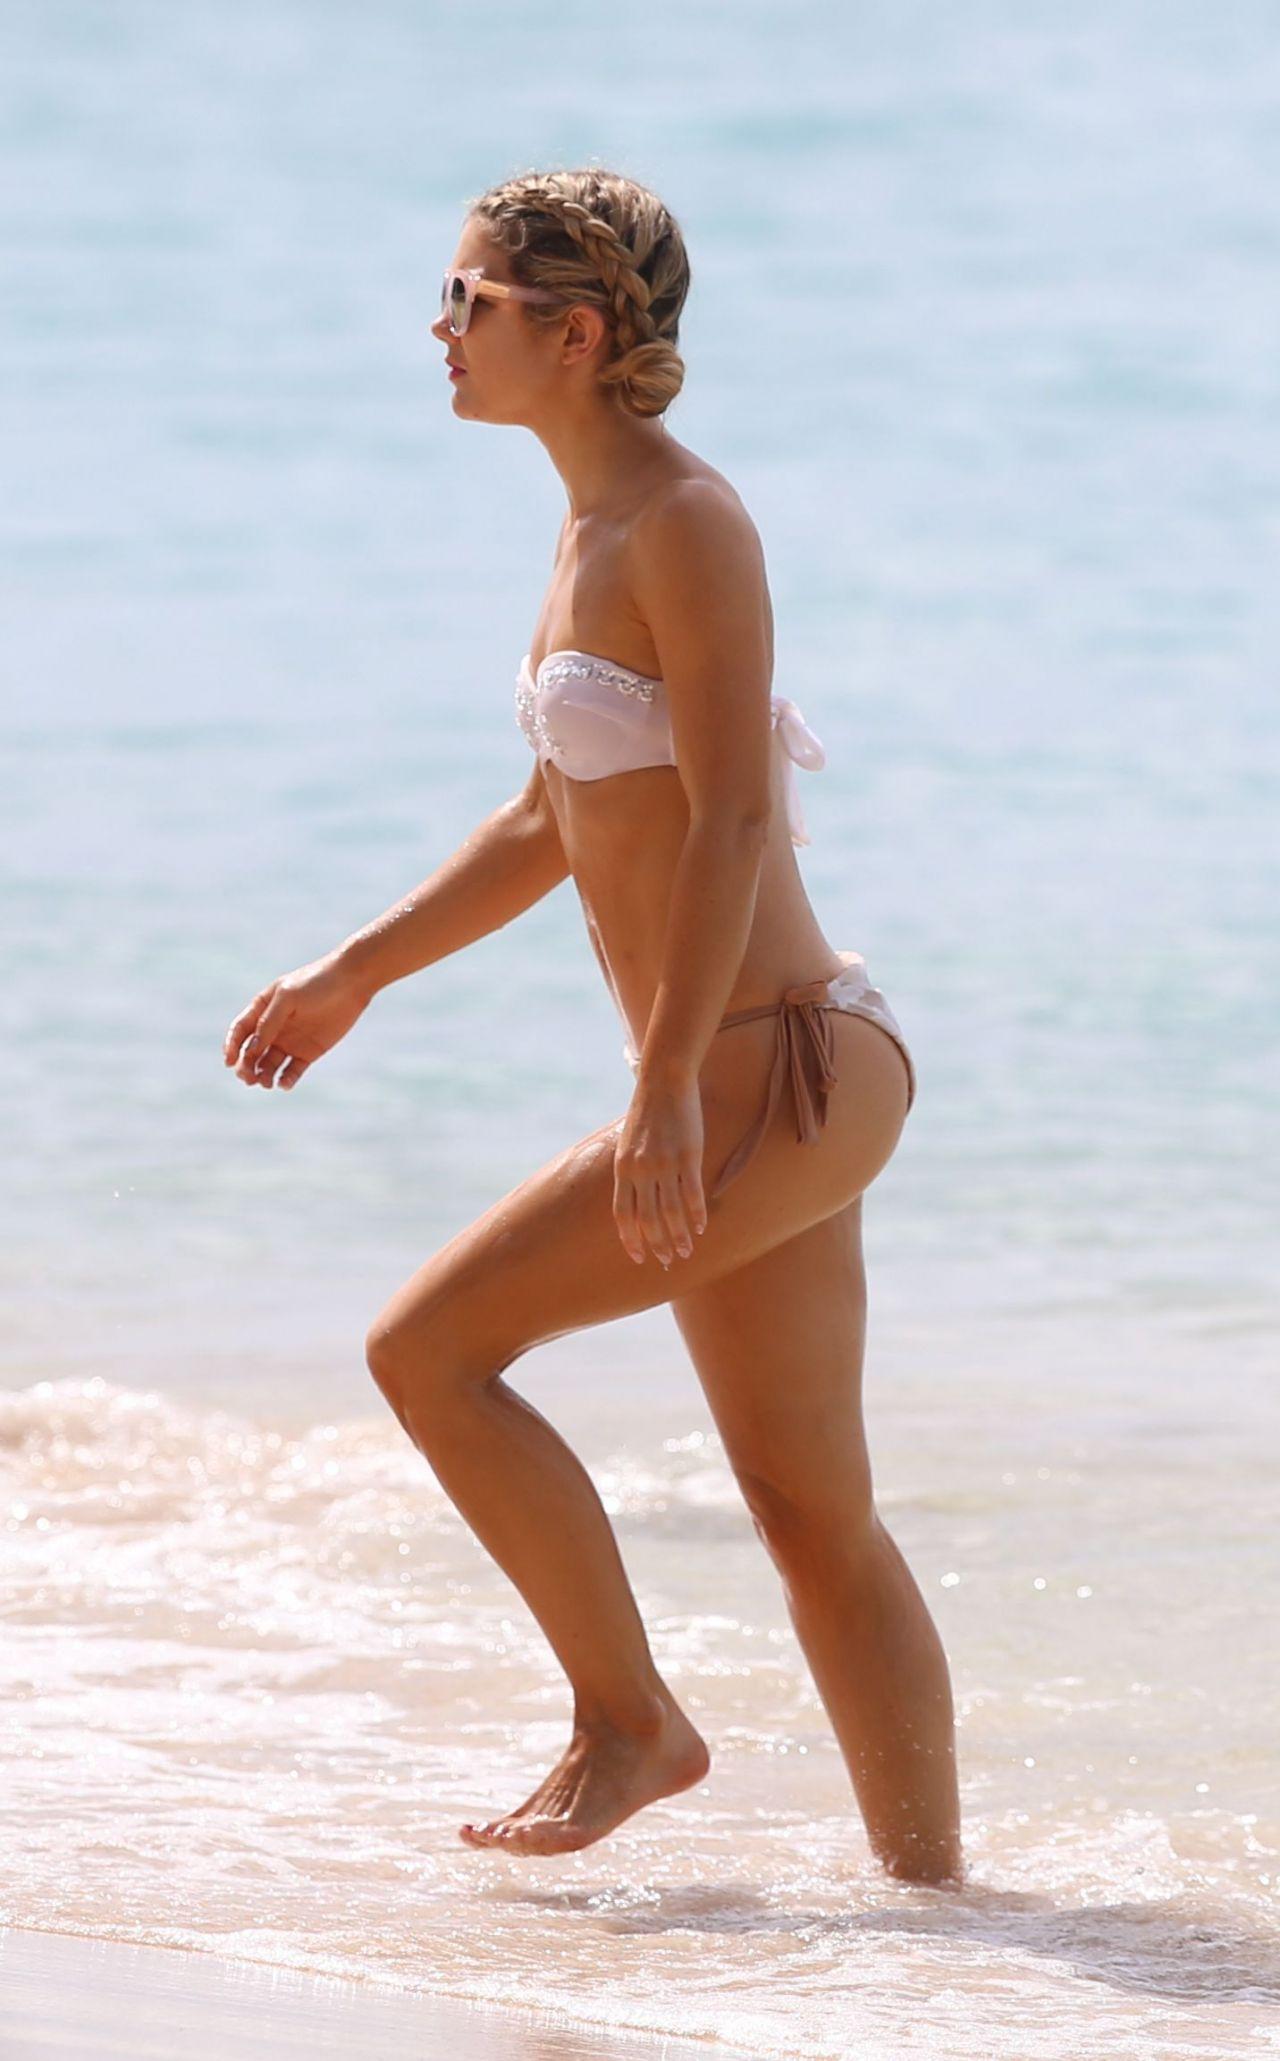 Jessica Rose Moor in Bikini on the beach in Barbados Pic 1 of 35